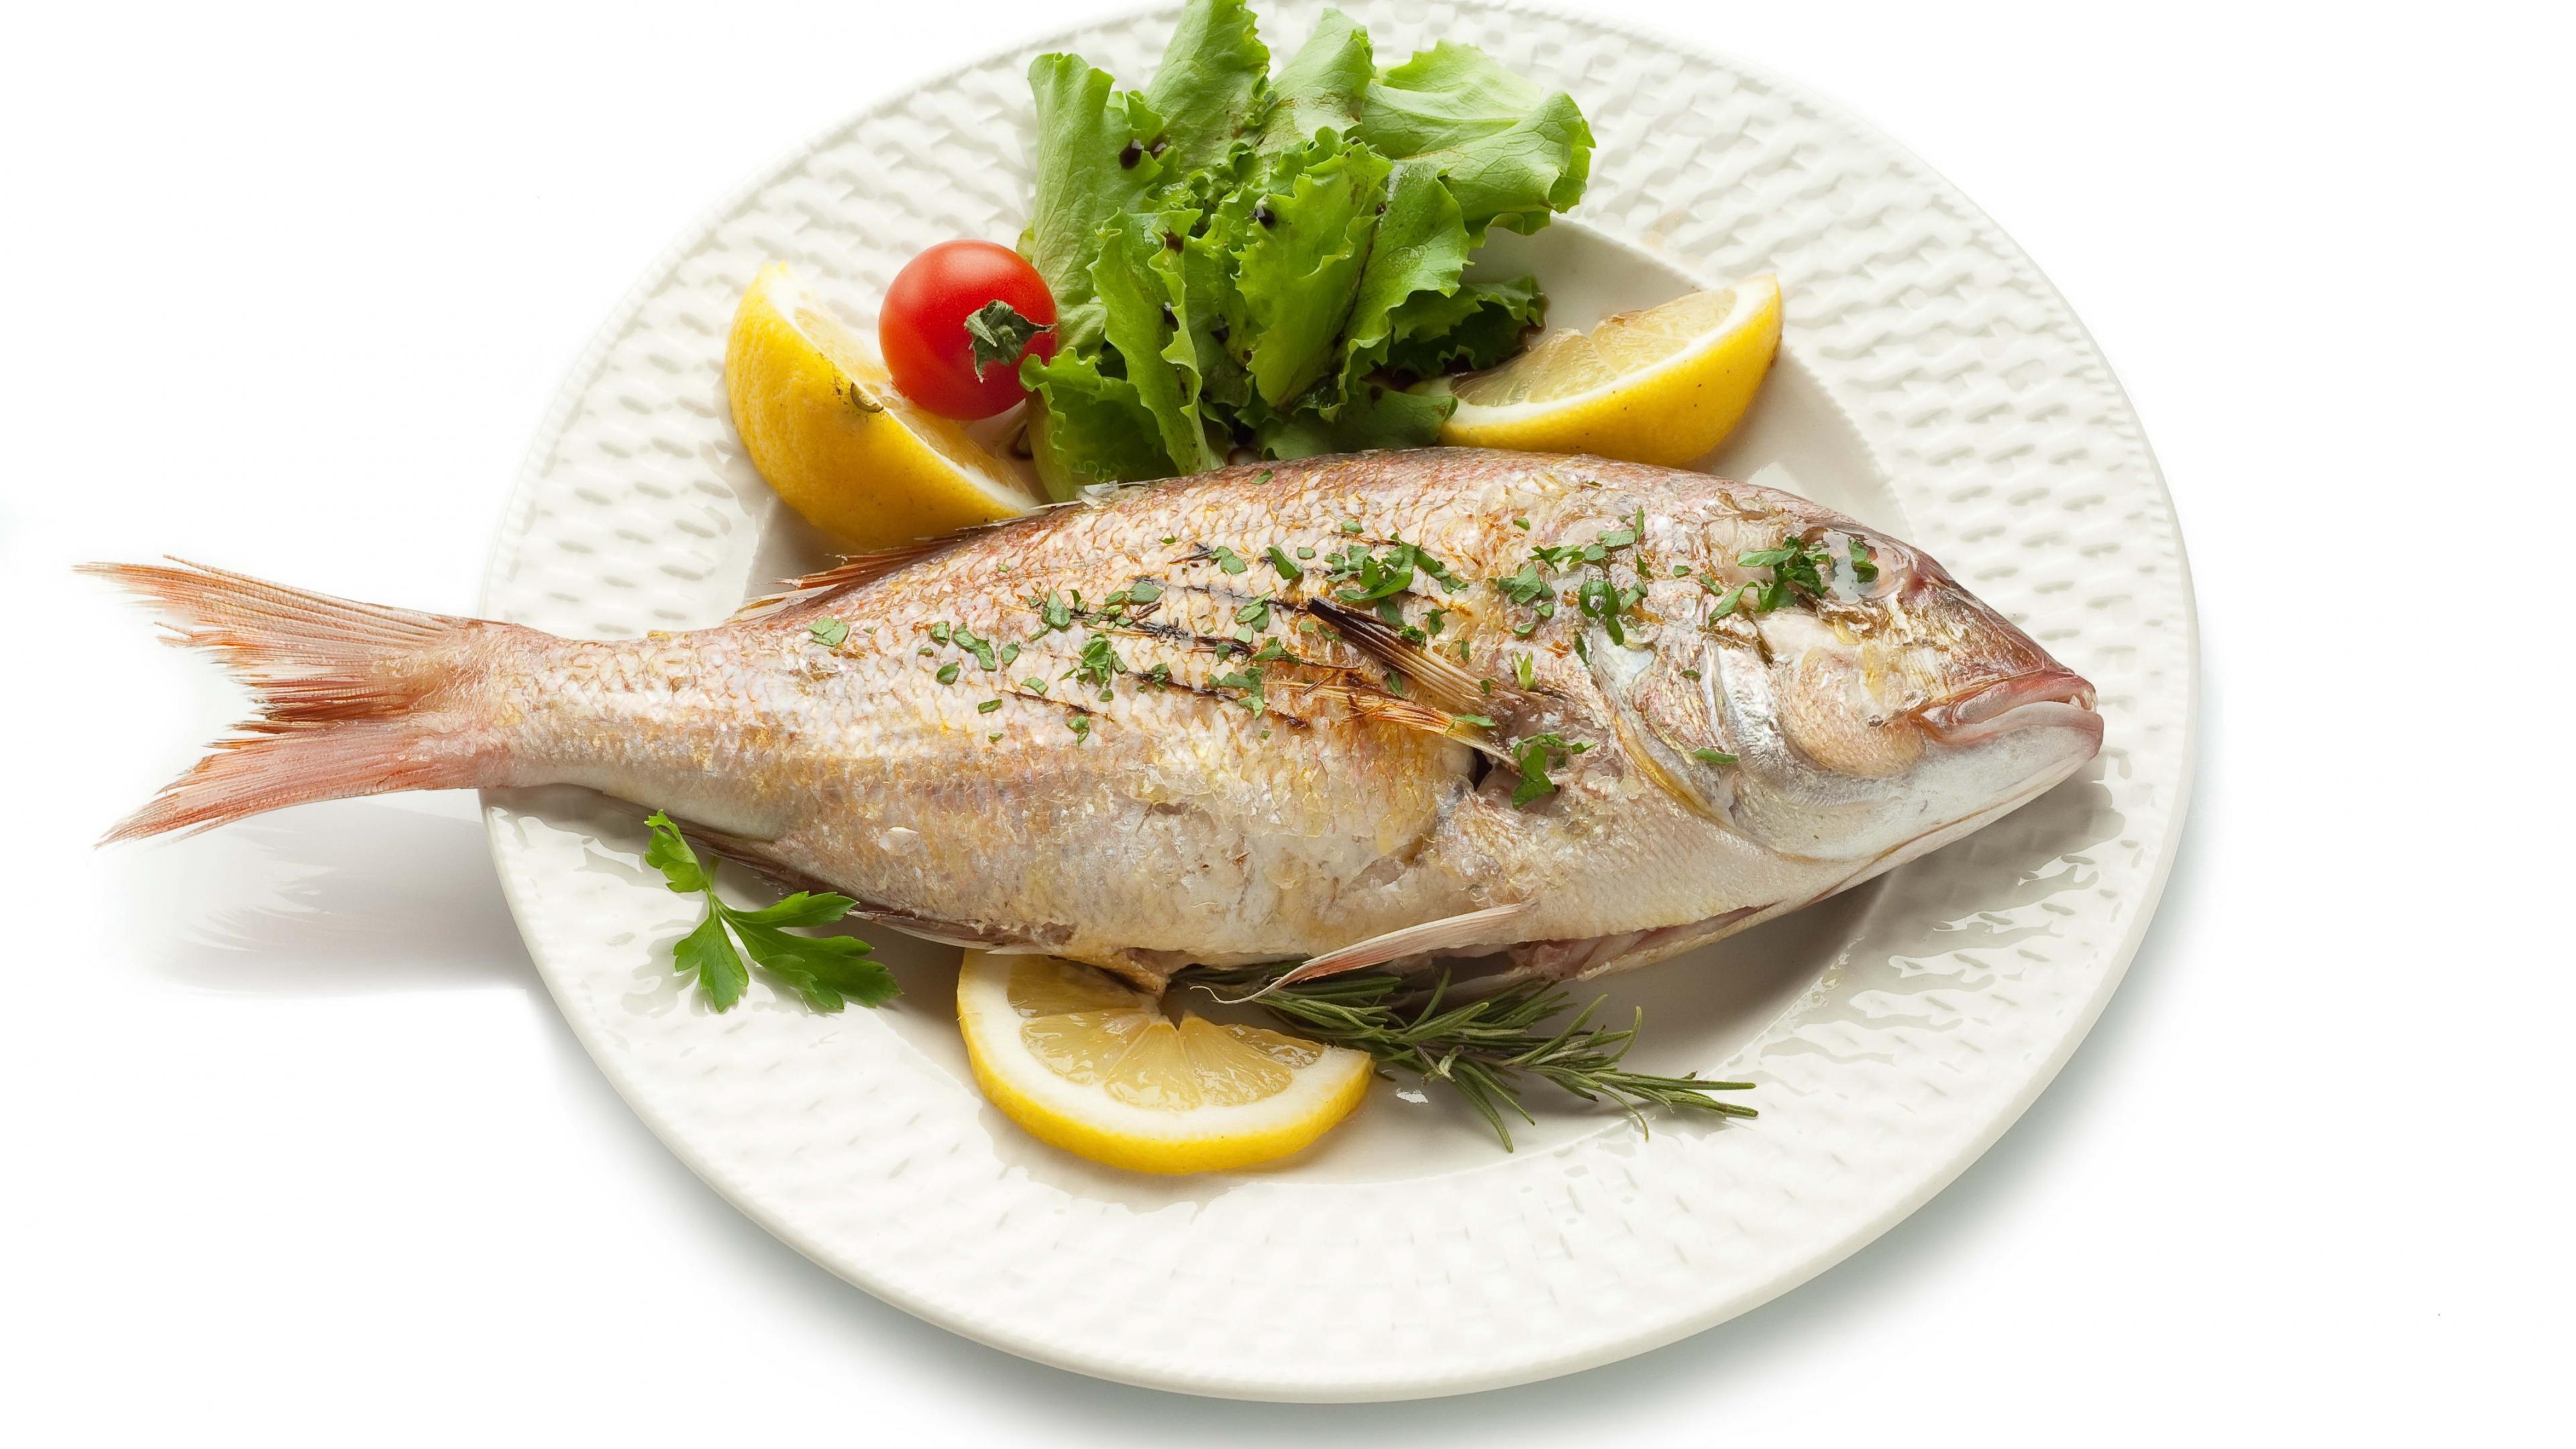 fish_dish_herbs_lemon_white_background_78321_3840x2160